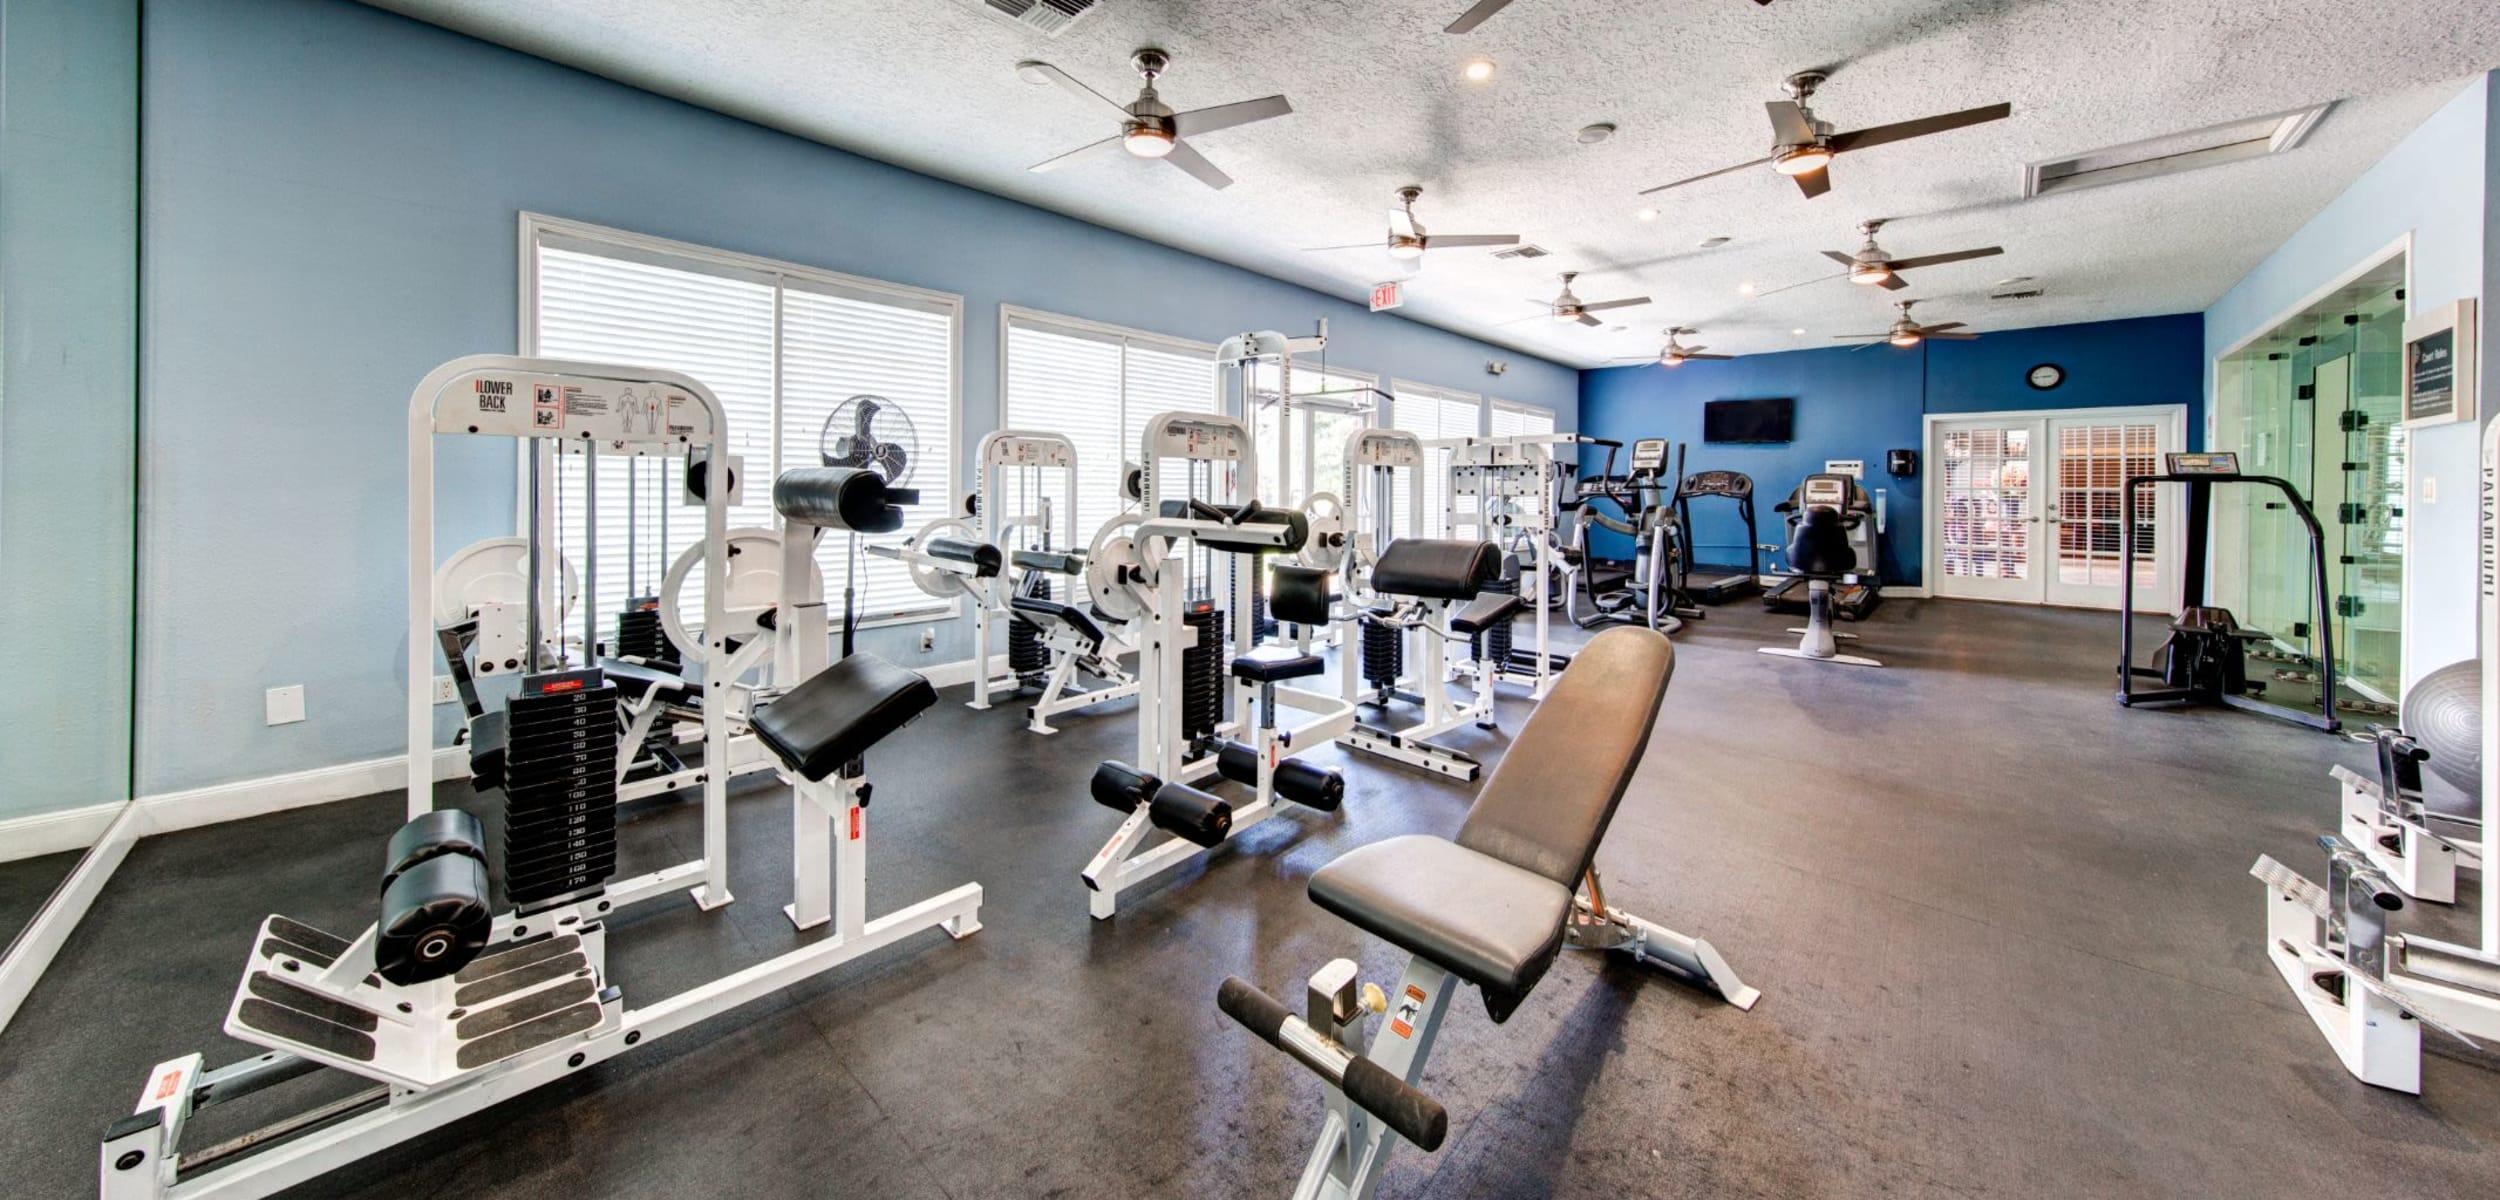 Fitness center at Marquis at Silverton in Cary, North Carolina